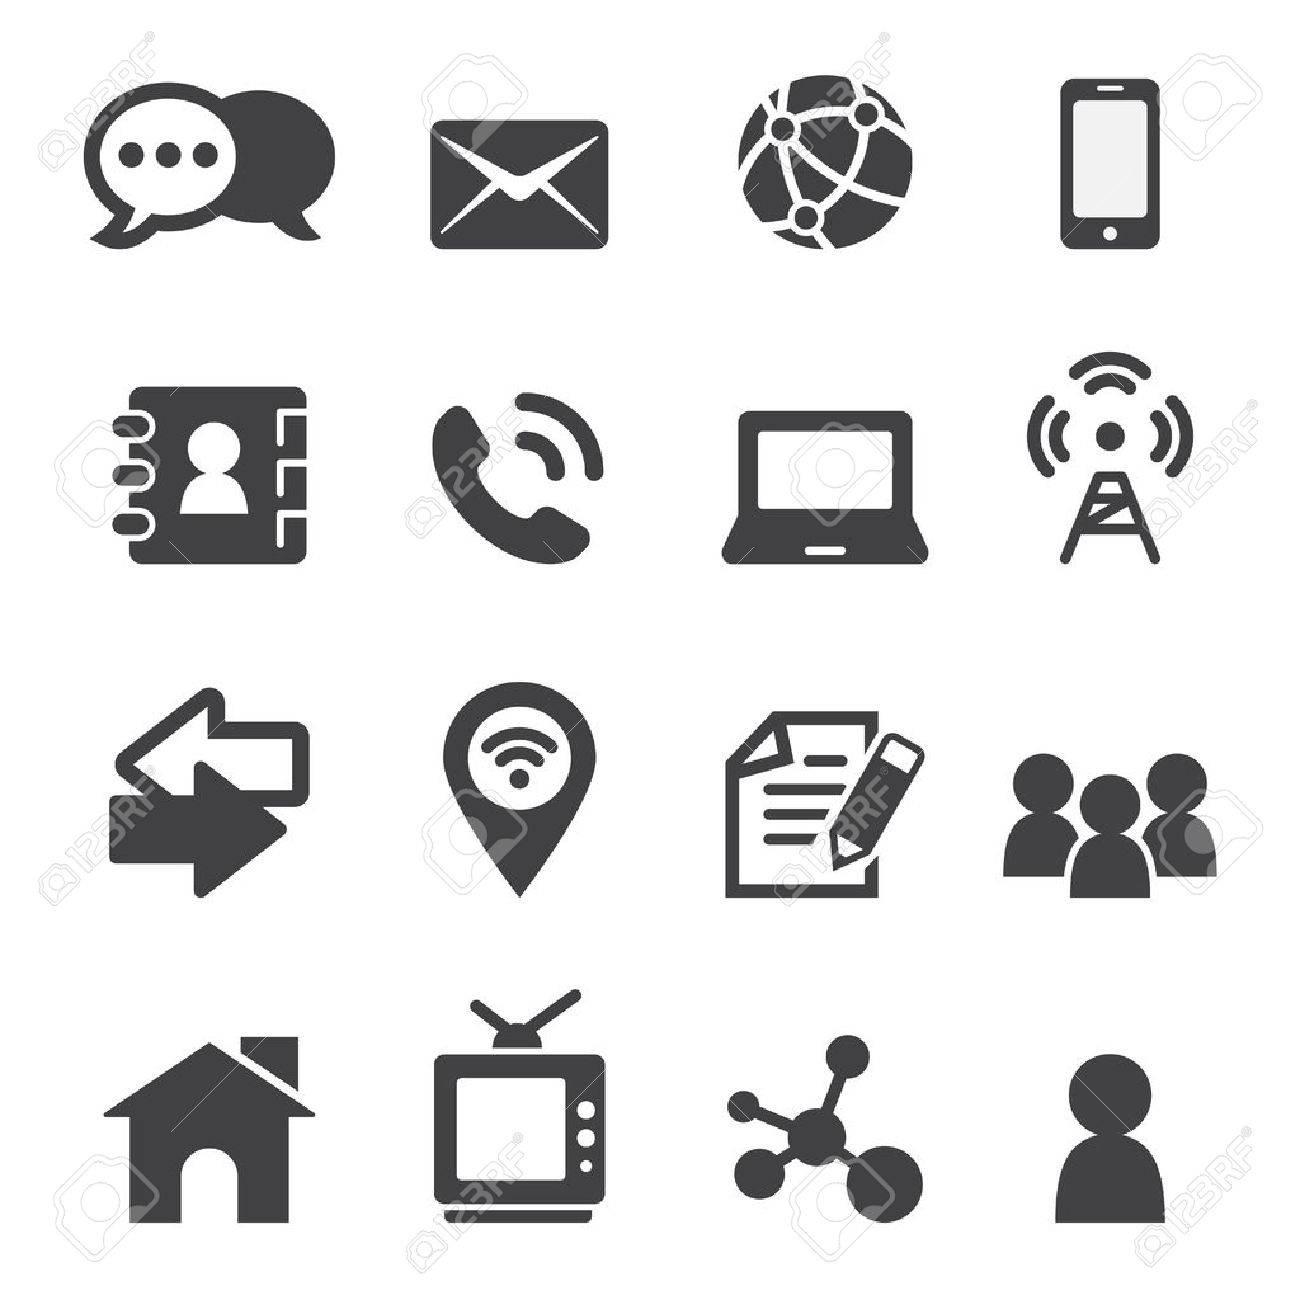 contact icon - 41198551